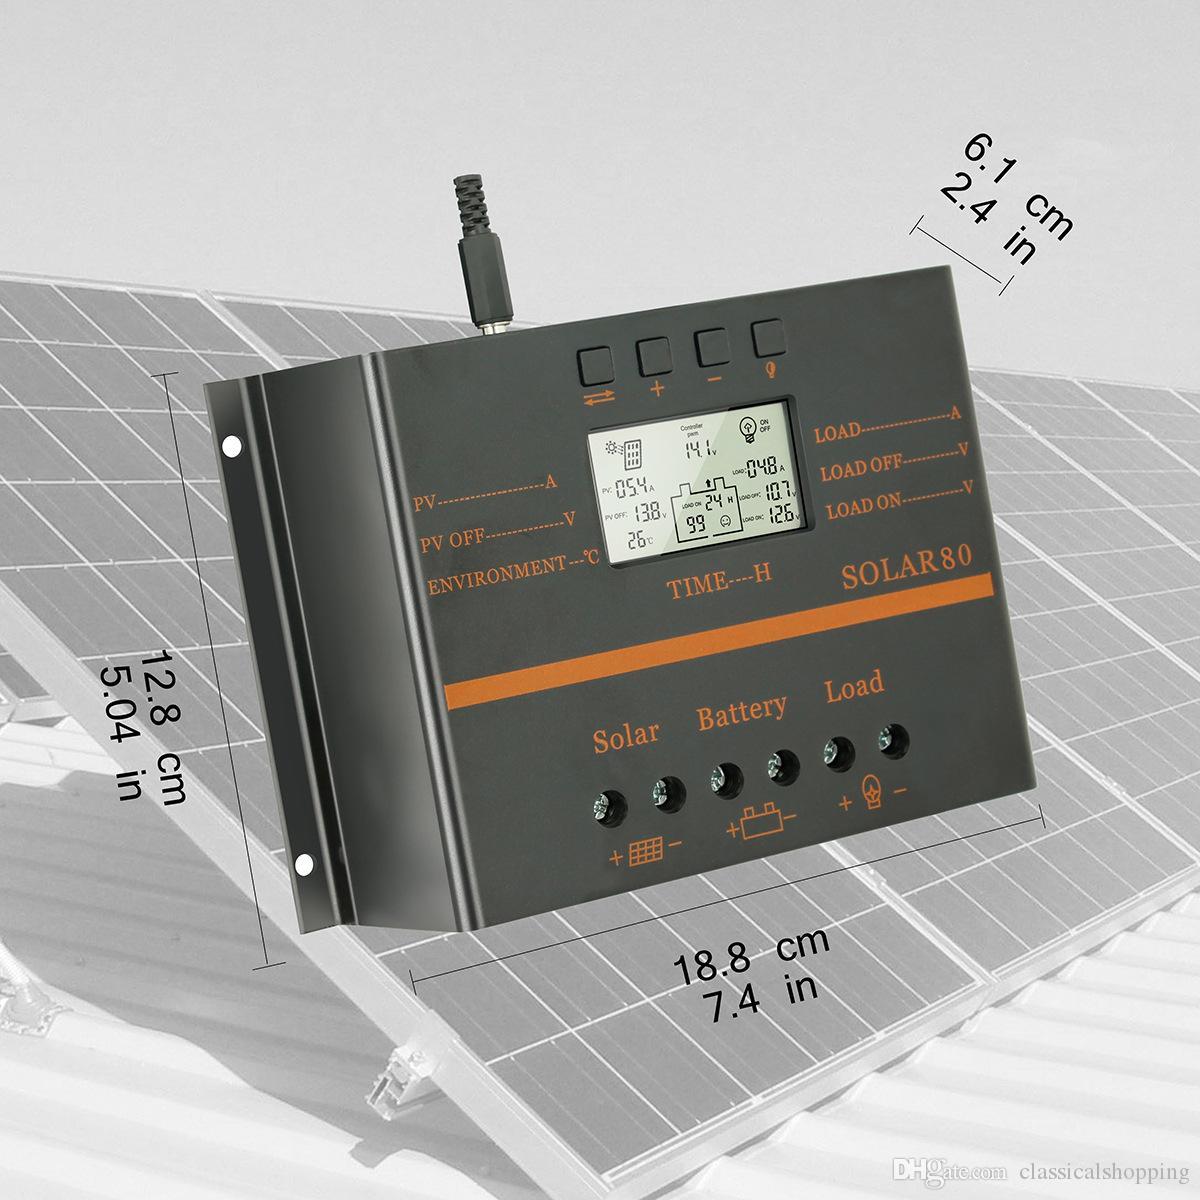 80A 12V 24V LCD Display Solar Panel Regulator Charge Controller With USB 5V +4X Z bracket Mount Flat Roof Wall Aluminum Set